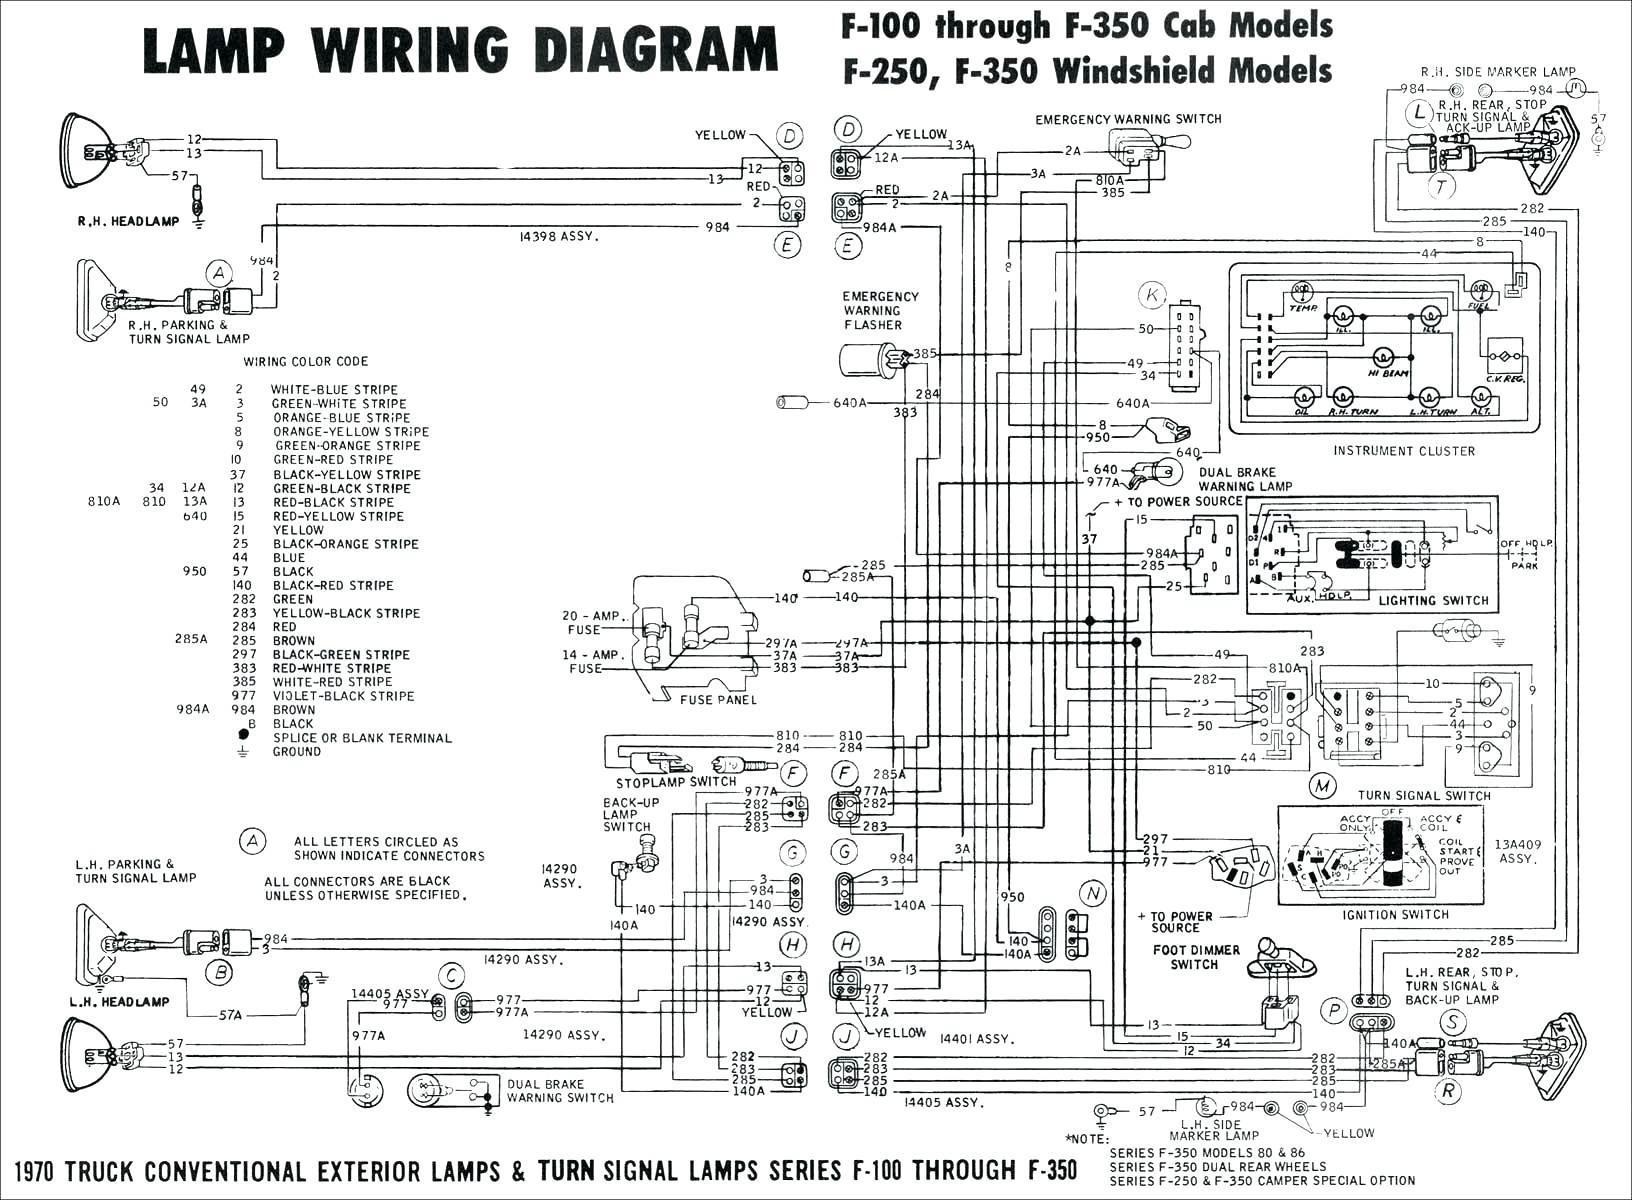 mercruiser 470 trim control wire diagram